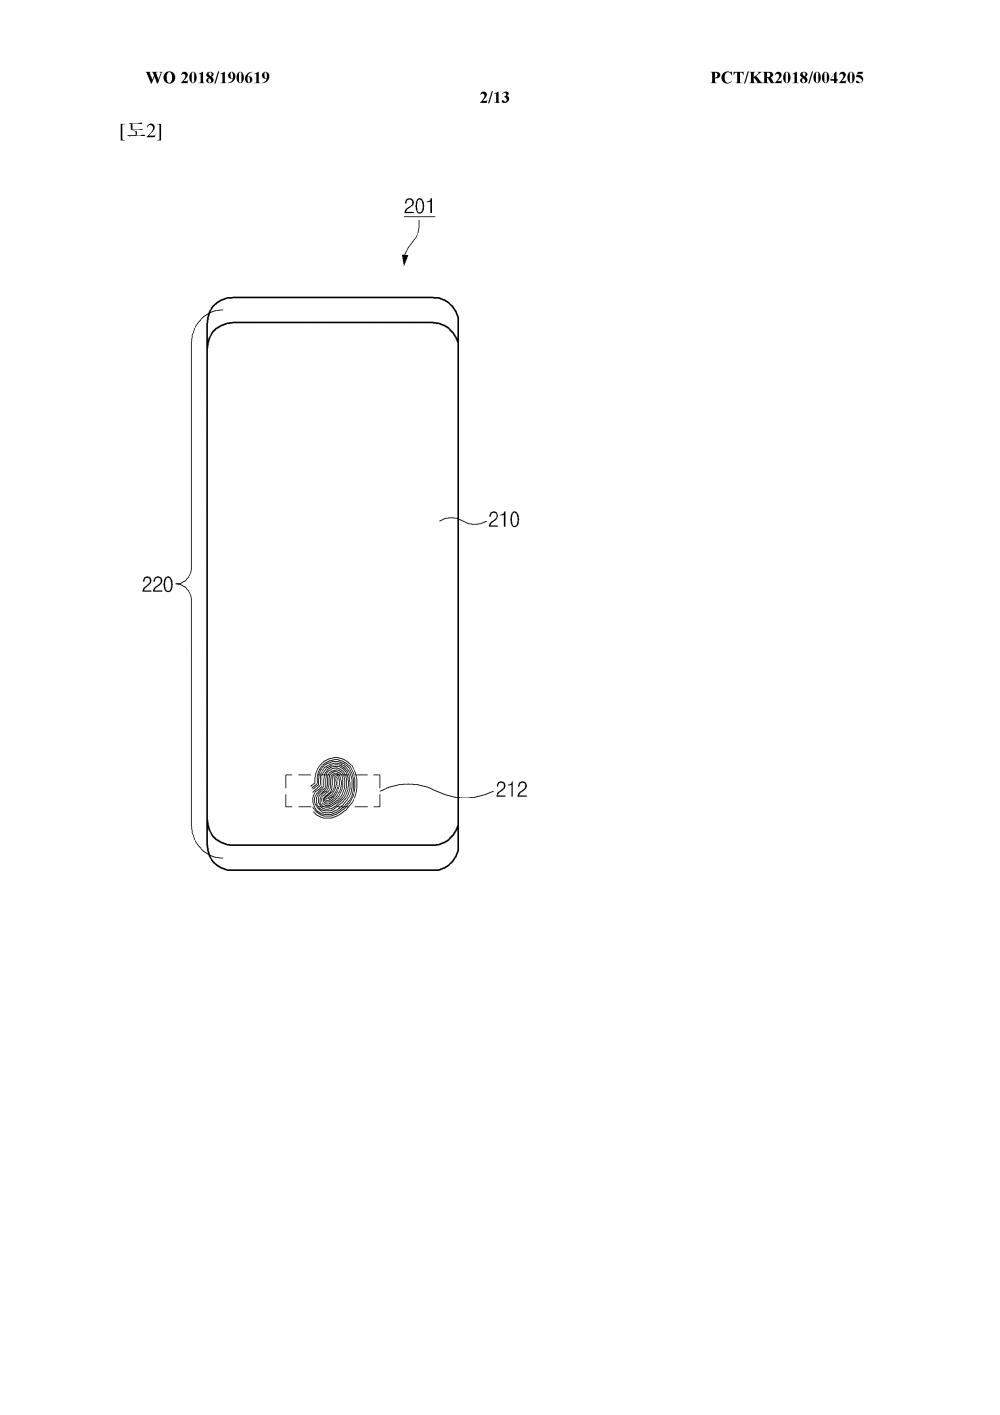 Samsung ligt achter op de OnePlus 6T